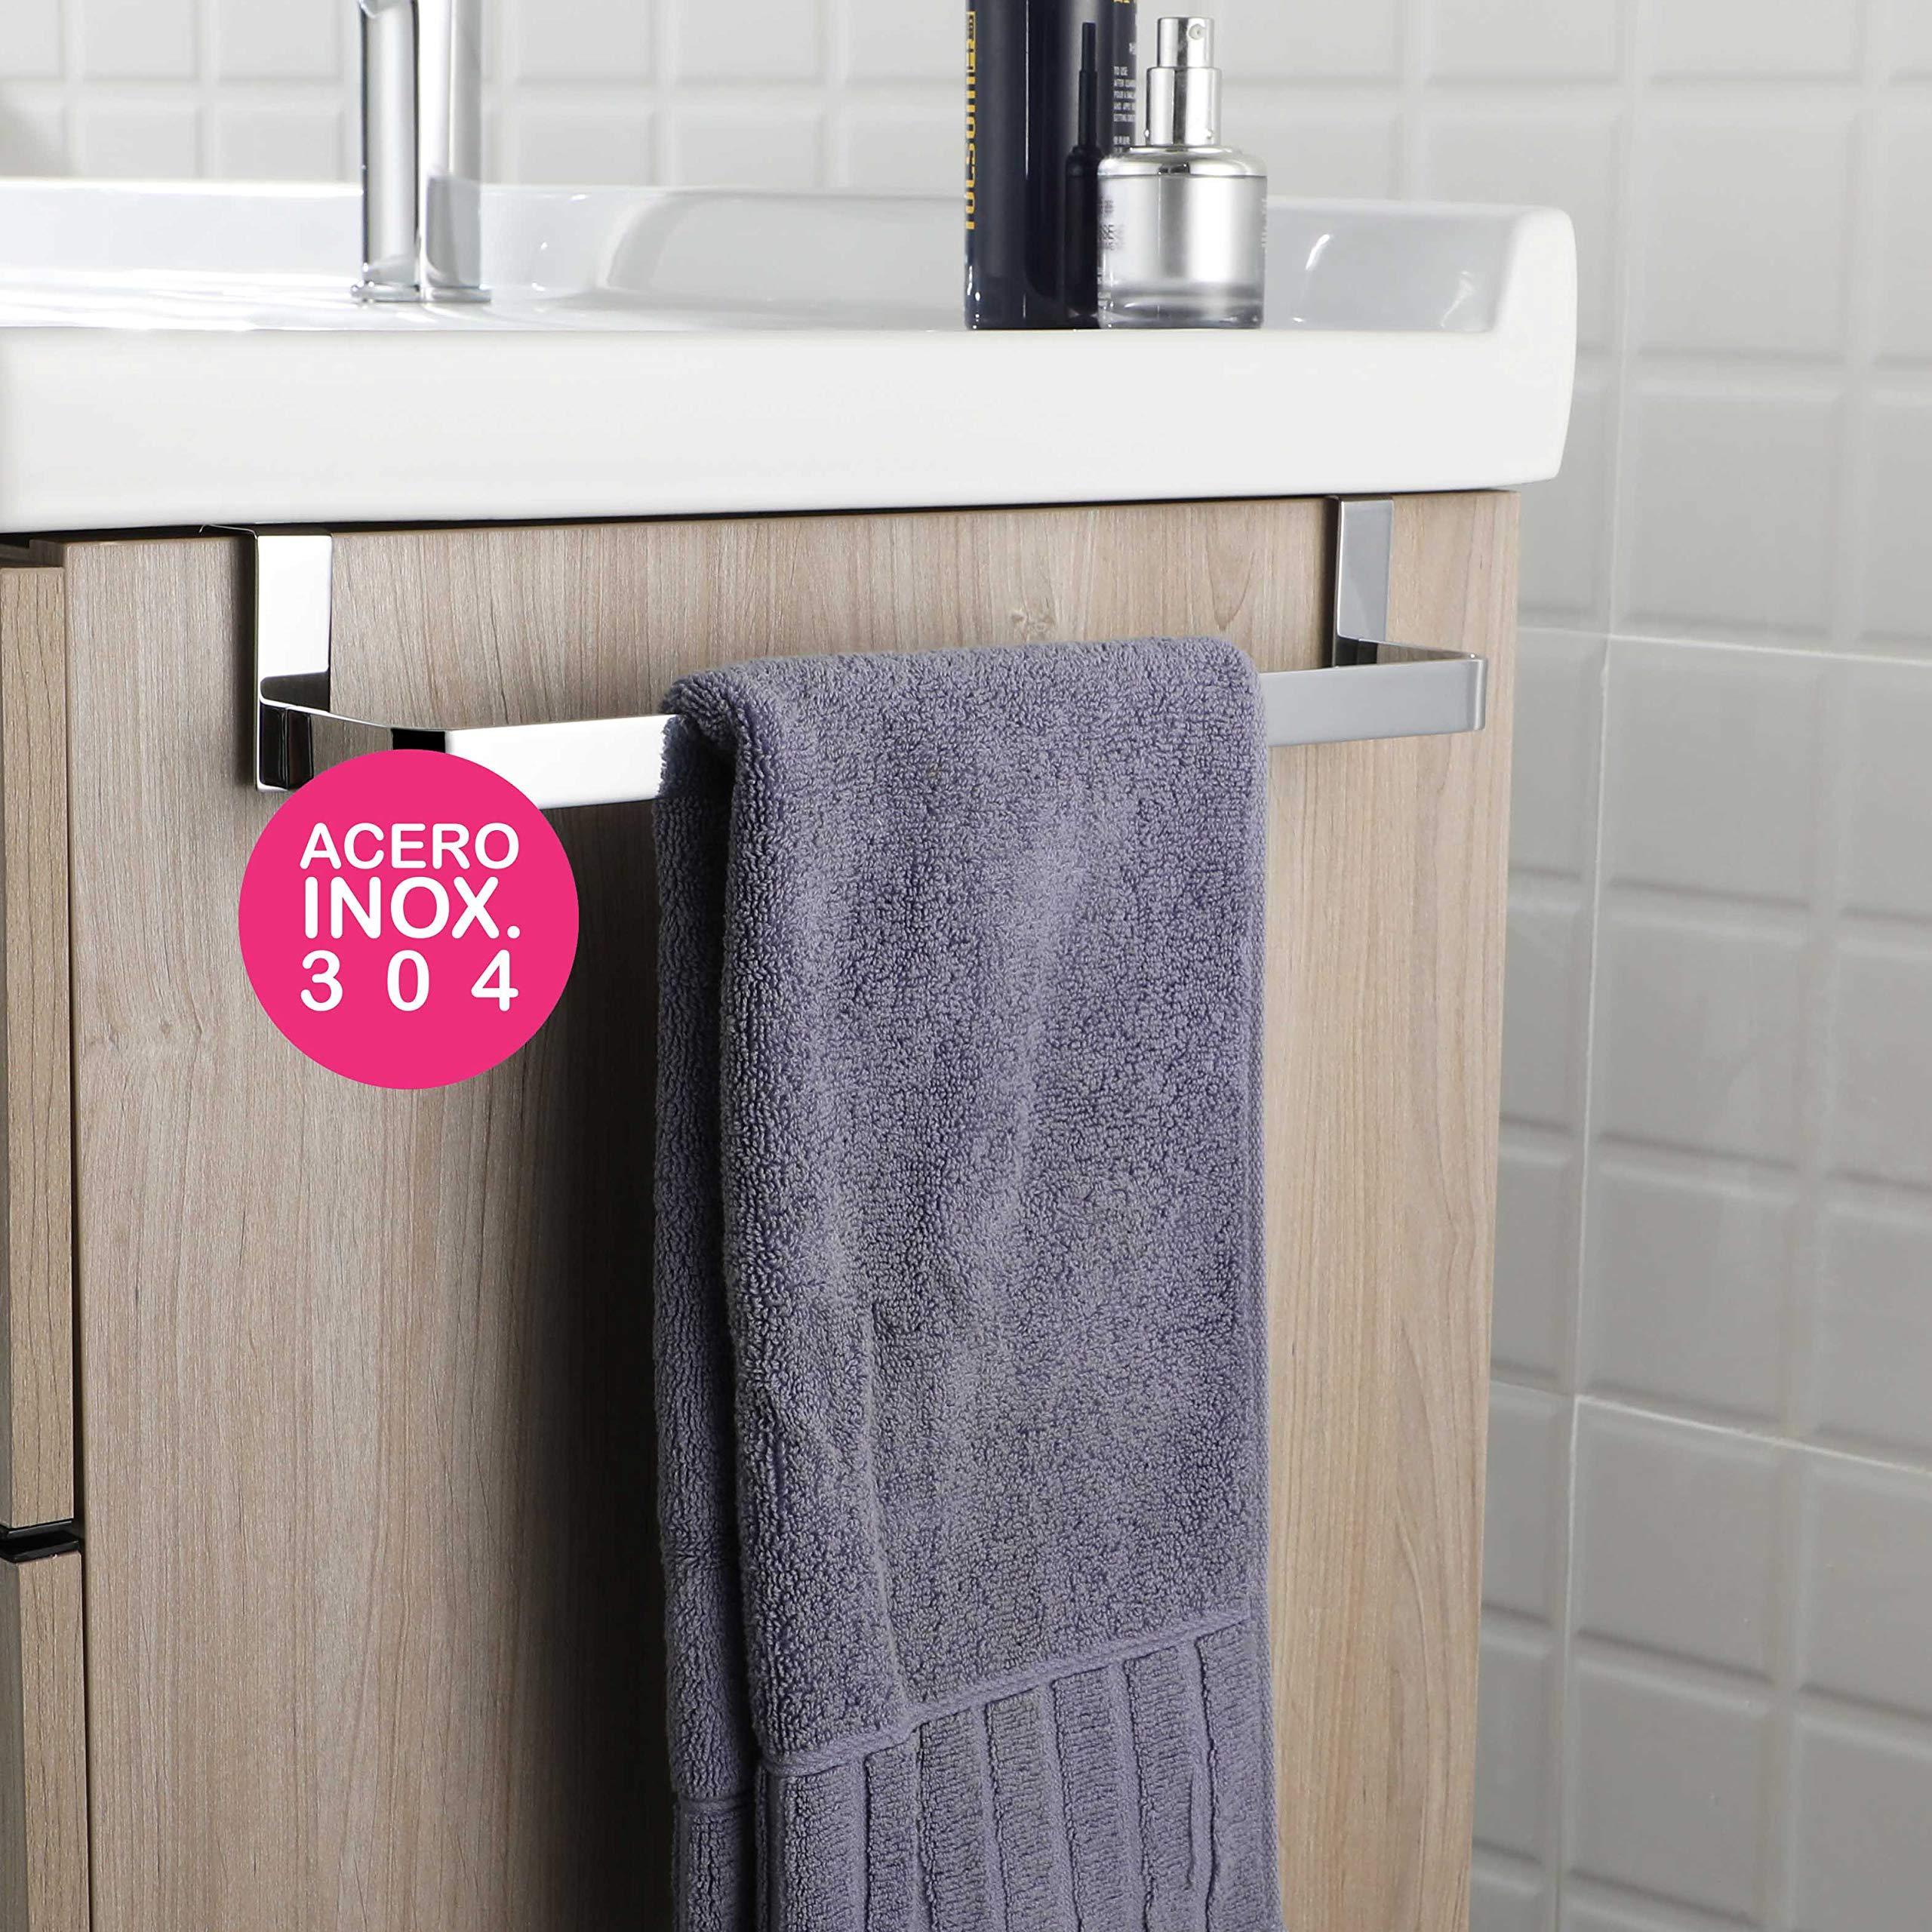 OXEN 321054 Toallero sin taladros para mueble de baño (29 cm) 29cm product image